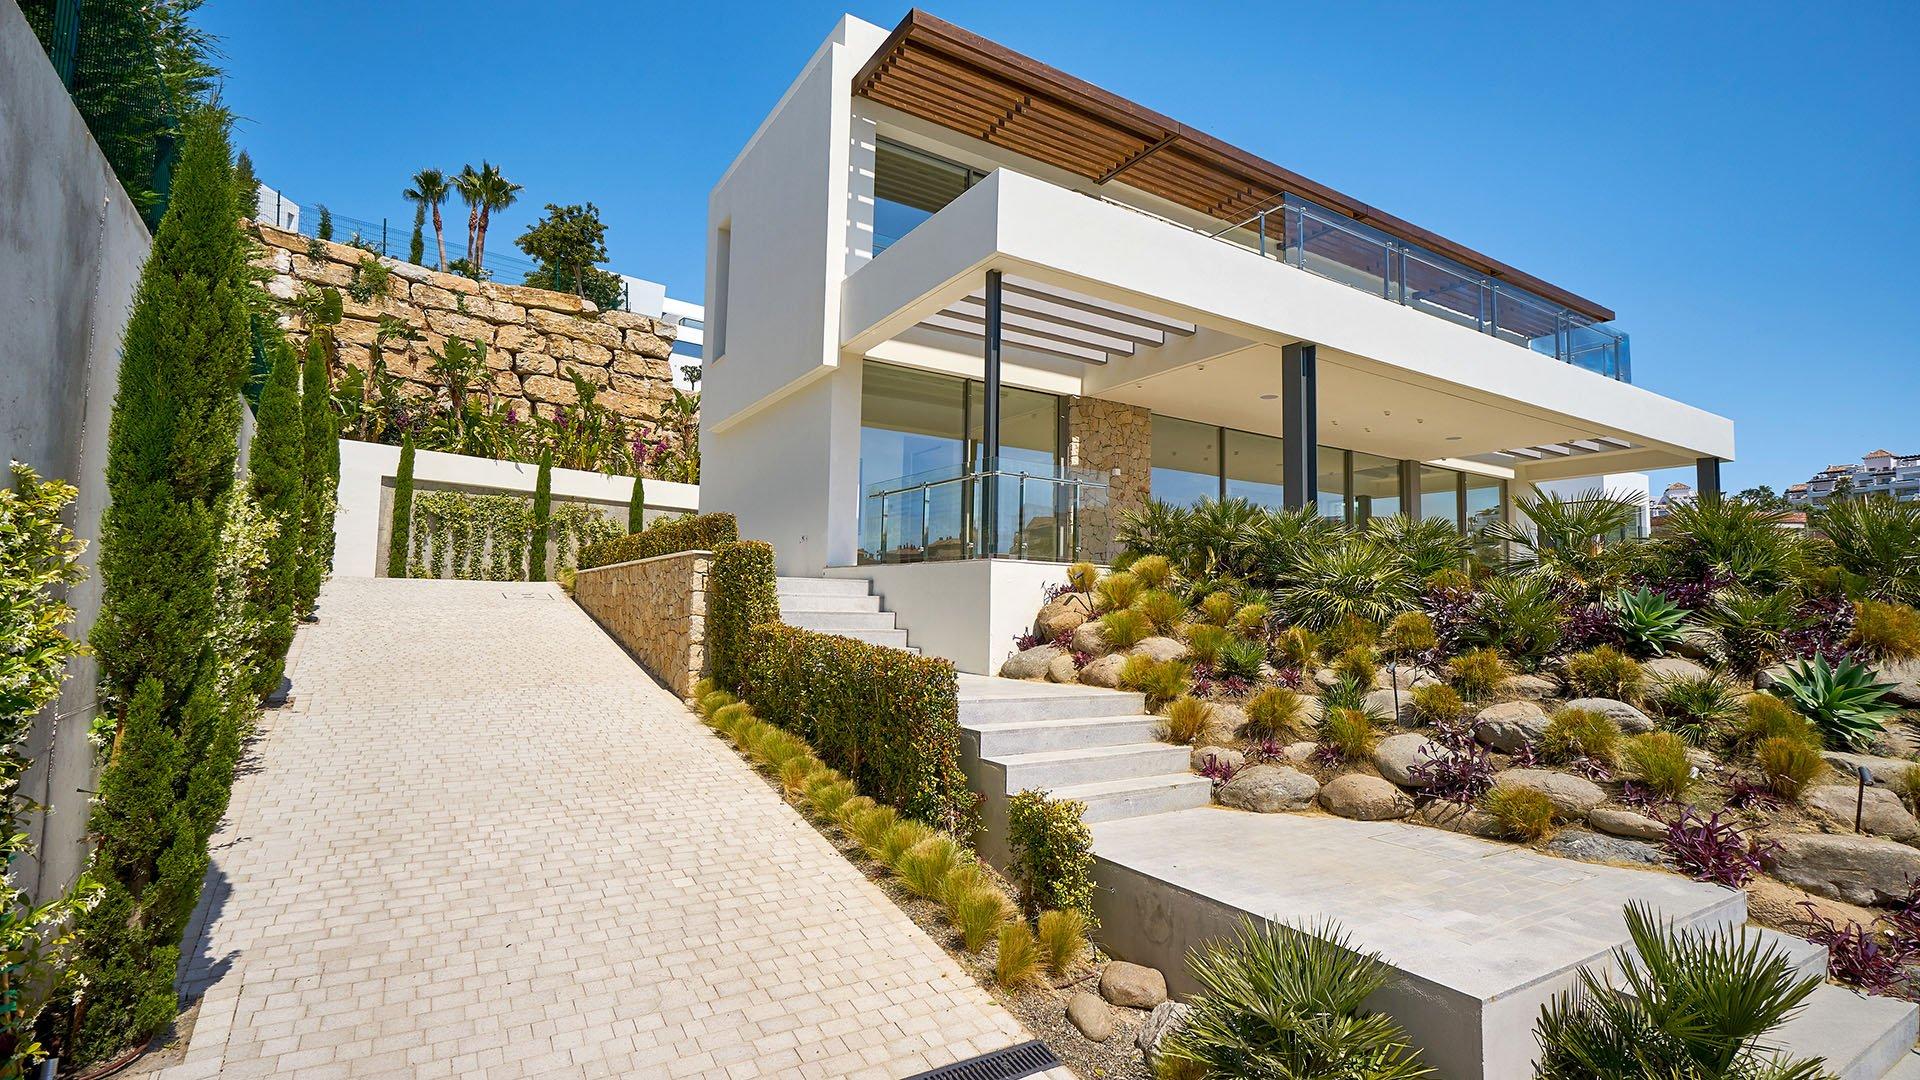 Villa Capanes Sur: Modern luxury villa with a front line golf location